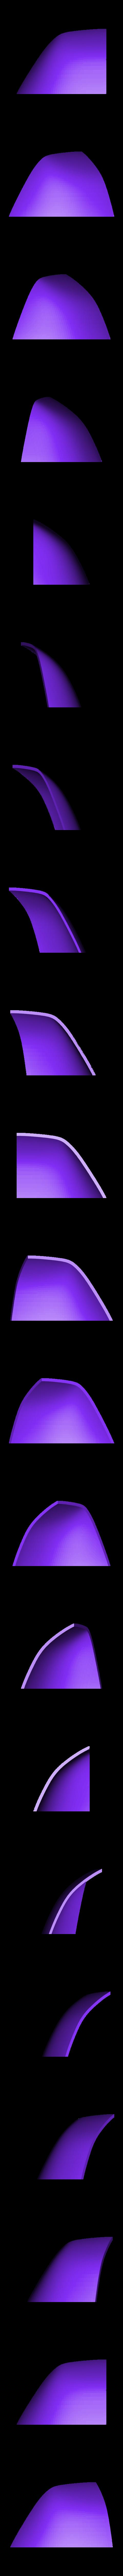 Part_1_v2.stl Download free STL file Battlestar Galactica Colonial Viper Pilot Helmet • 3D printing object, VillainousPropShop